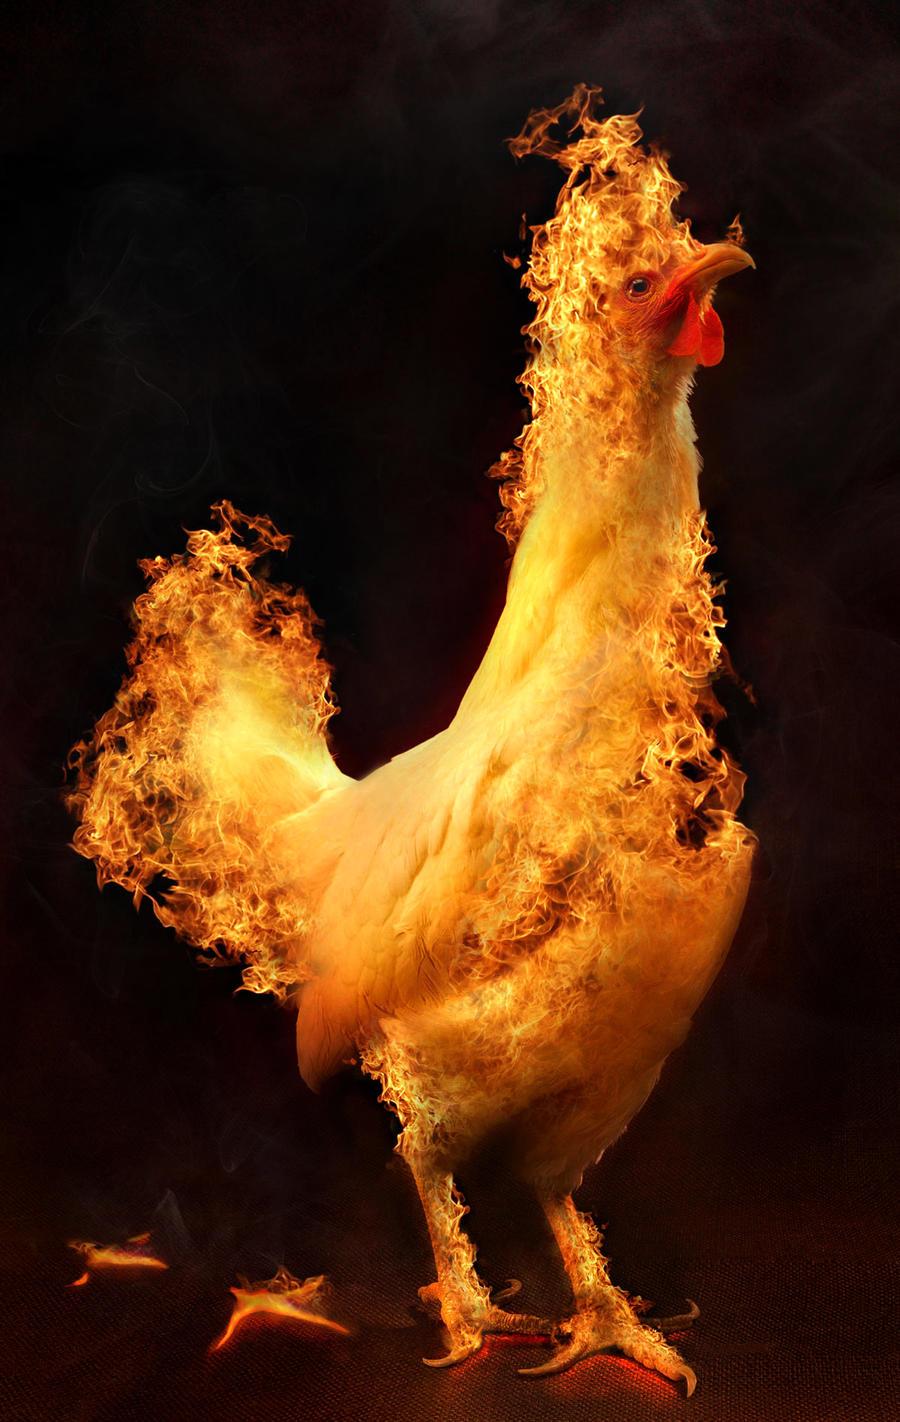 fire chicken by flipflopninja on deviantart